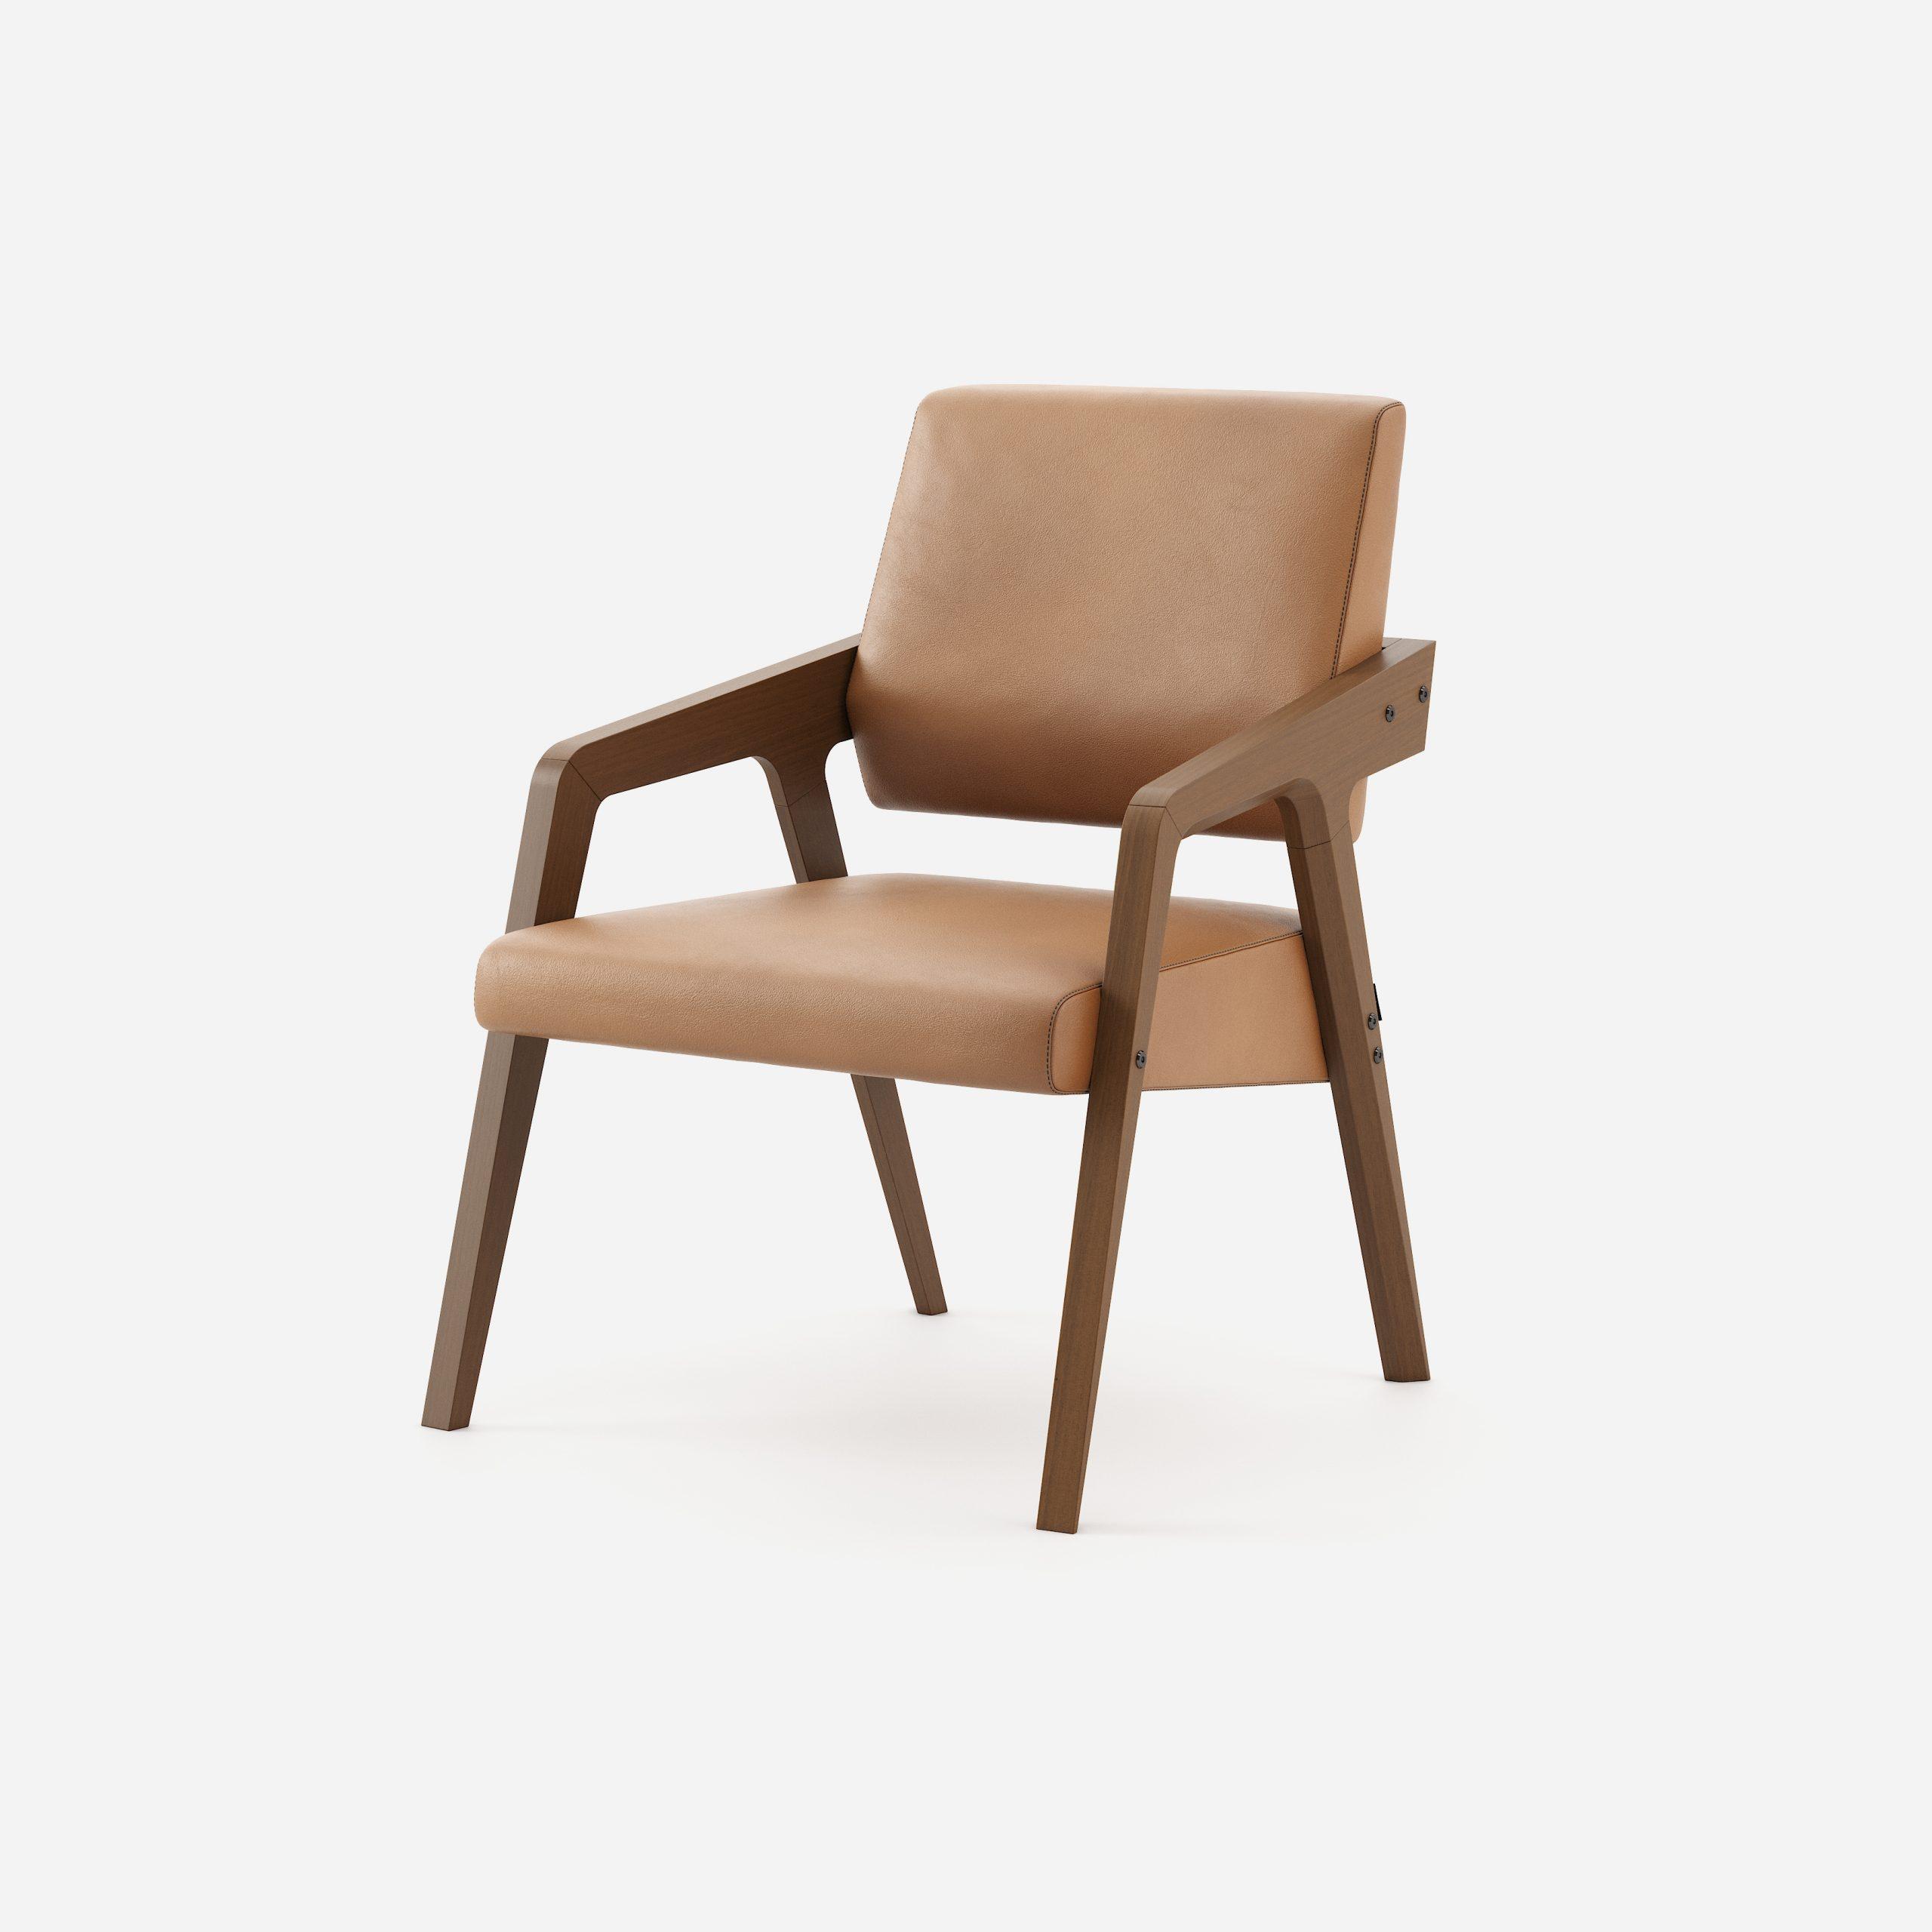 Modernus krėsliukas Joan